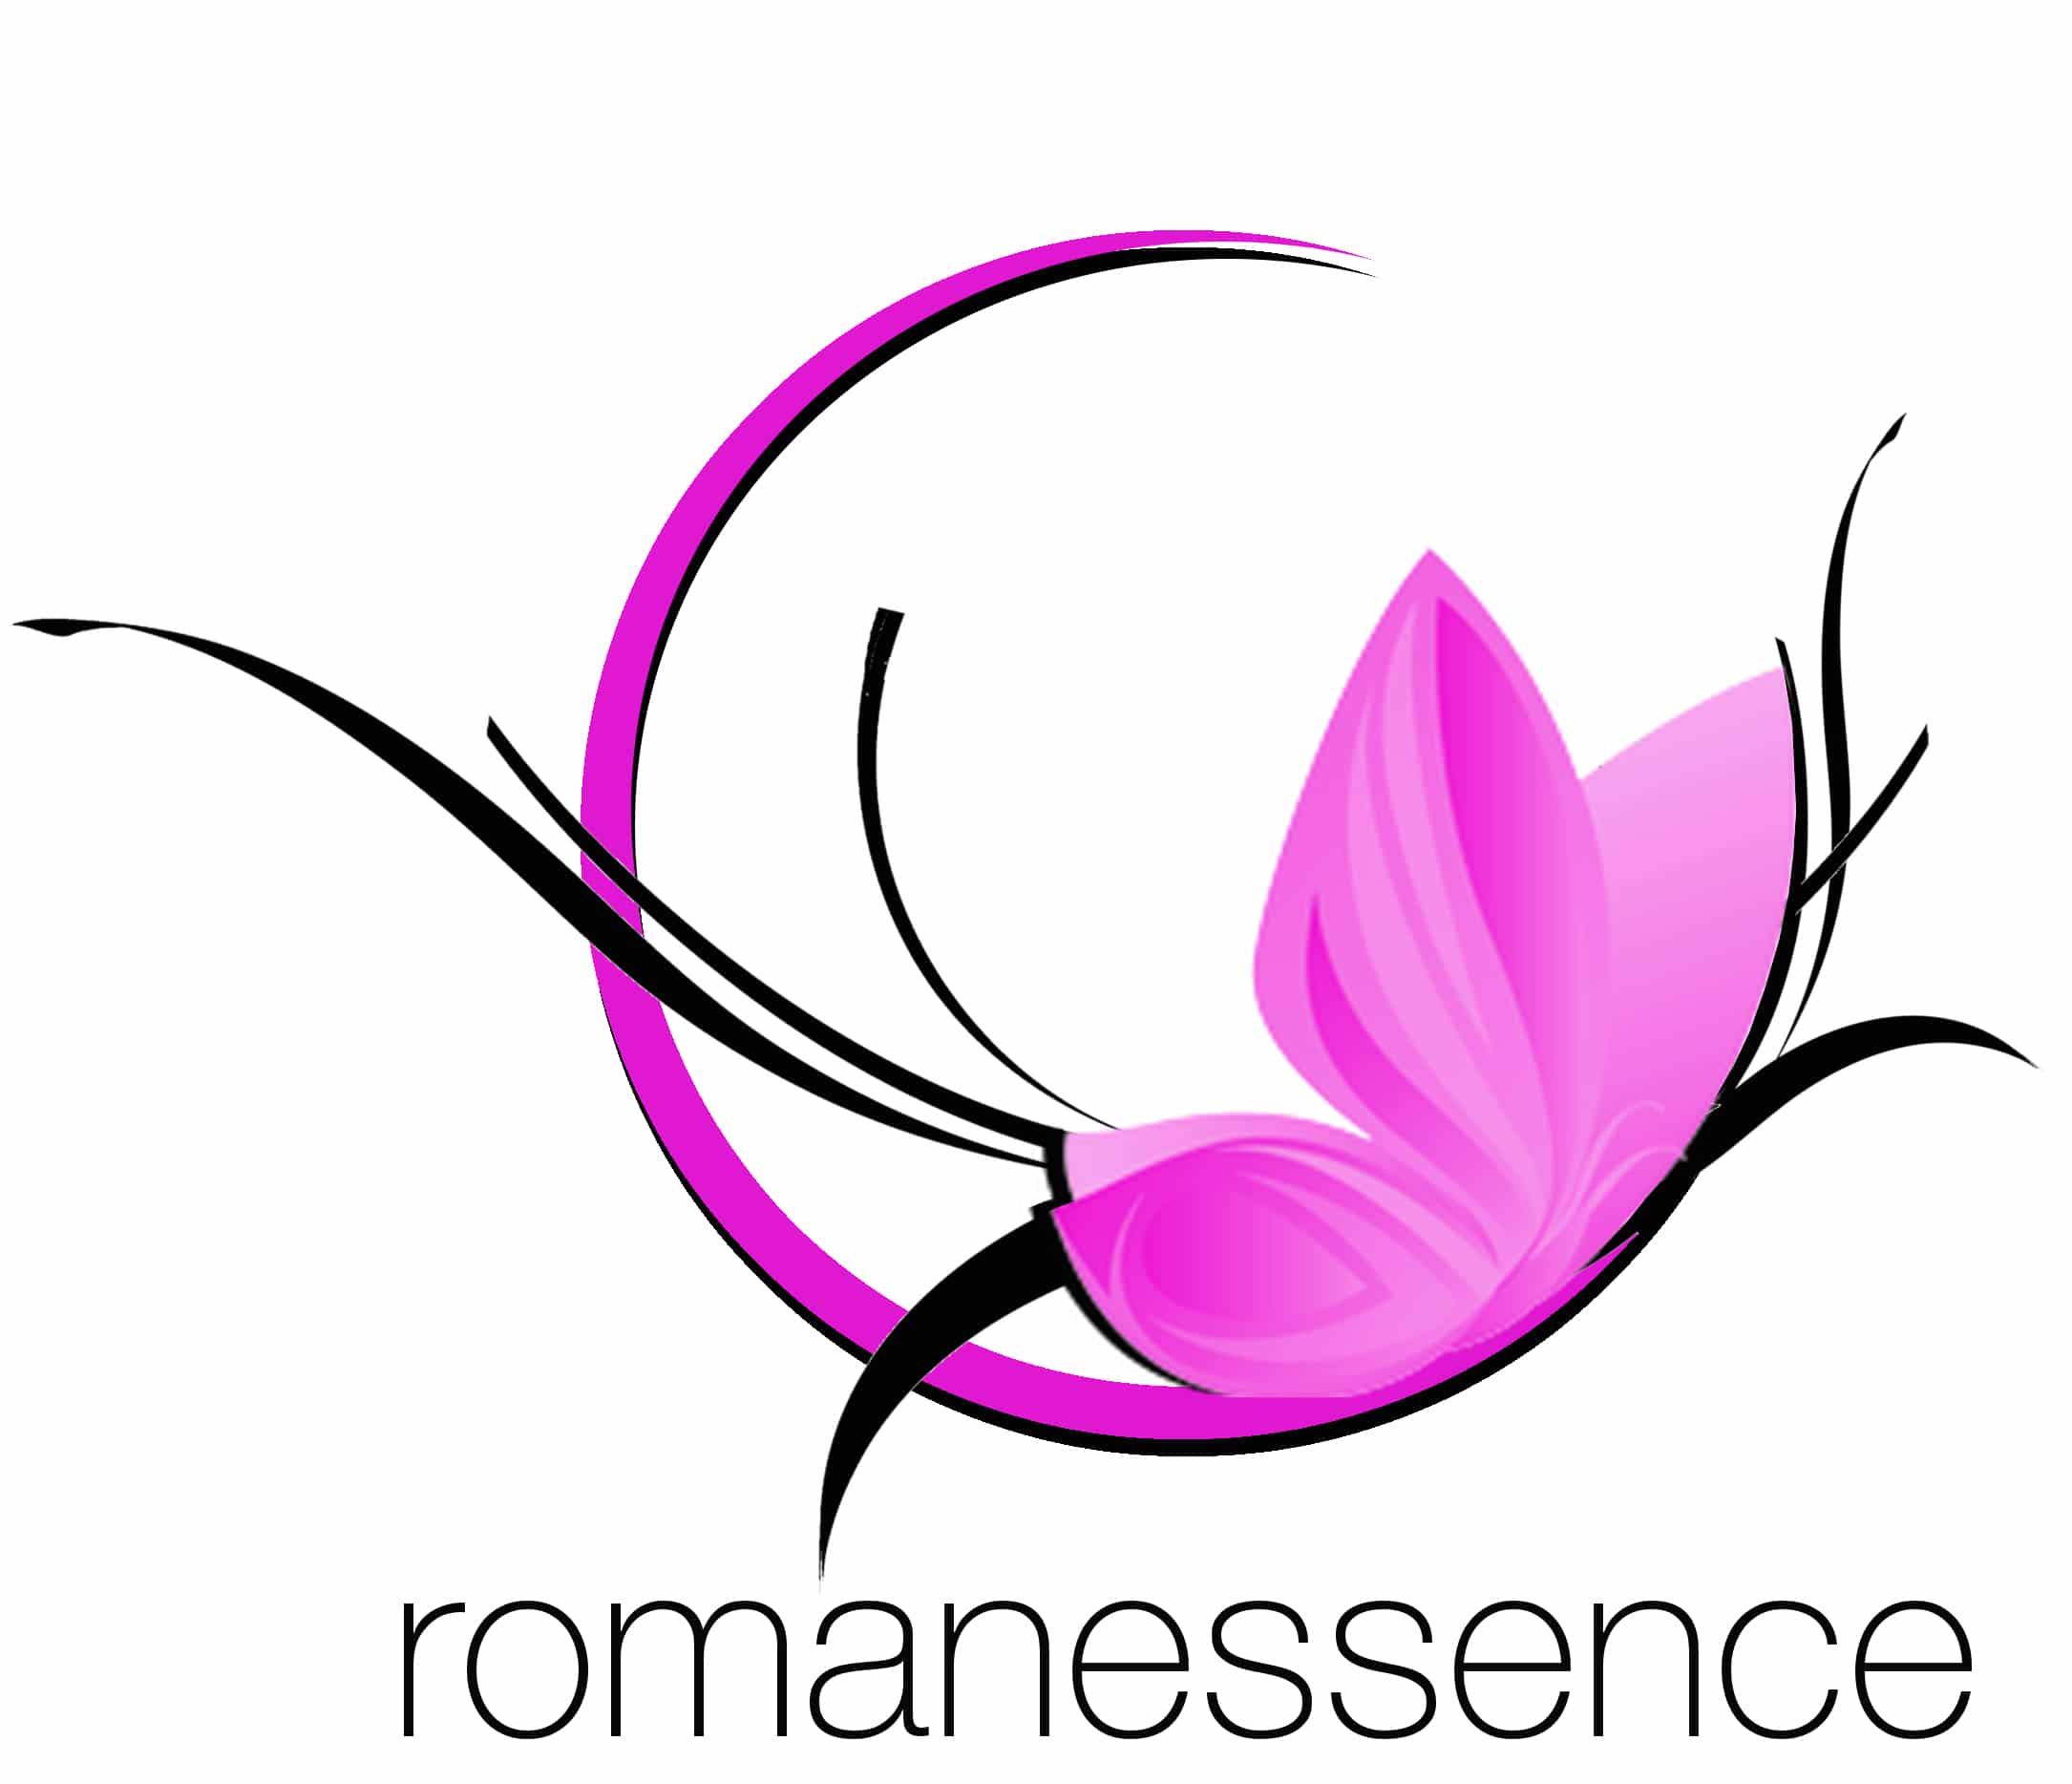 LOGO ROMANESSENCEV1 (1)